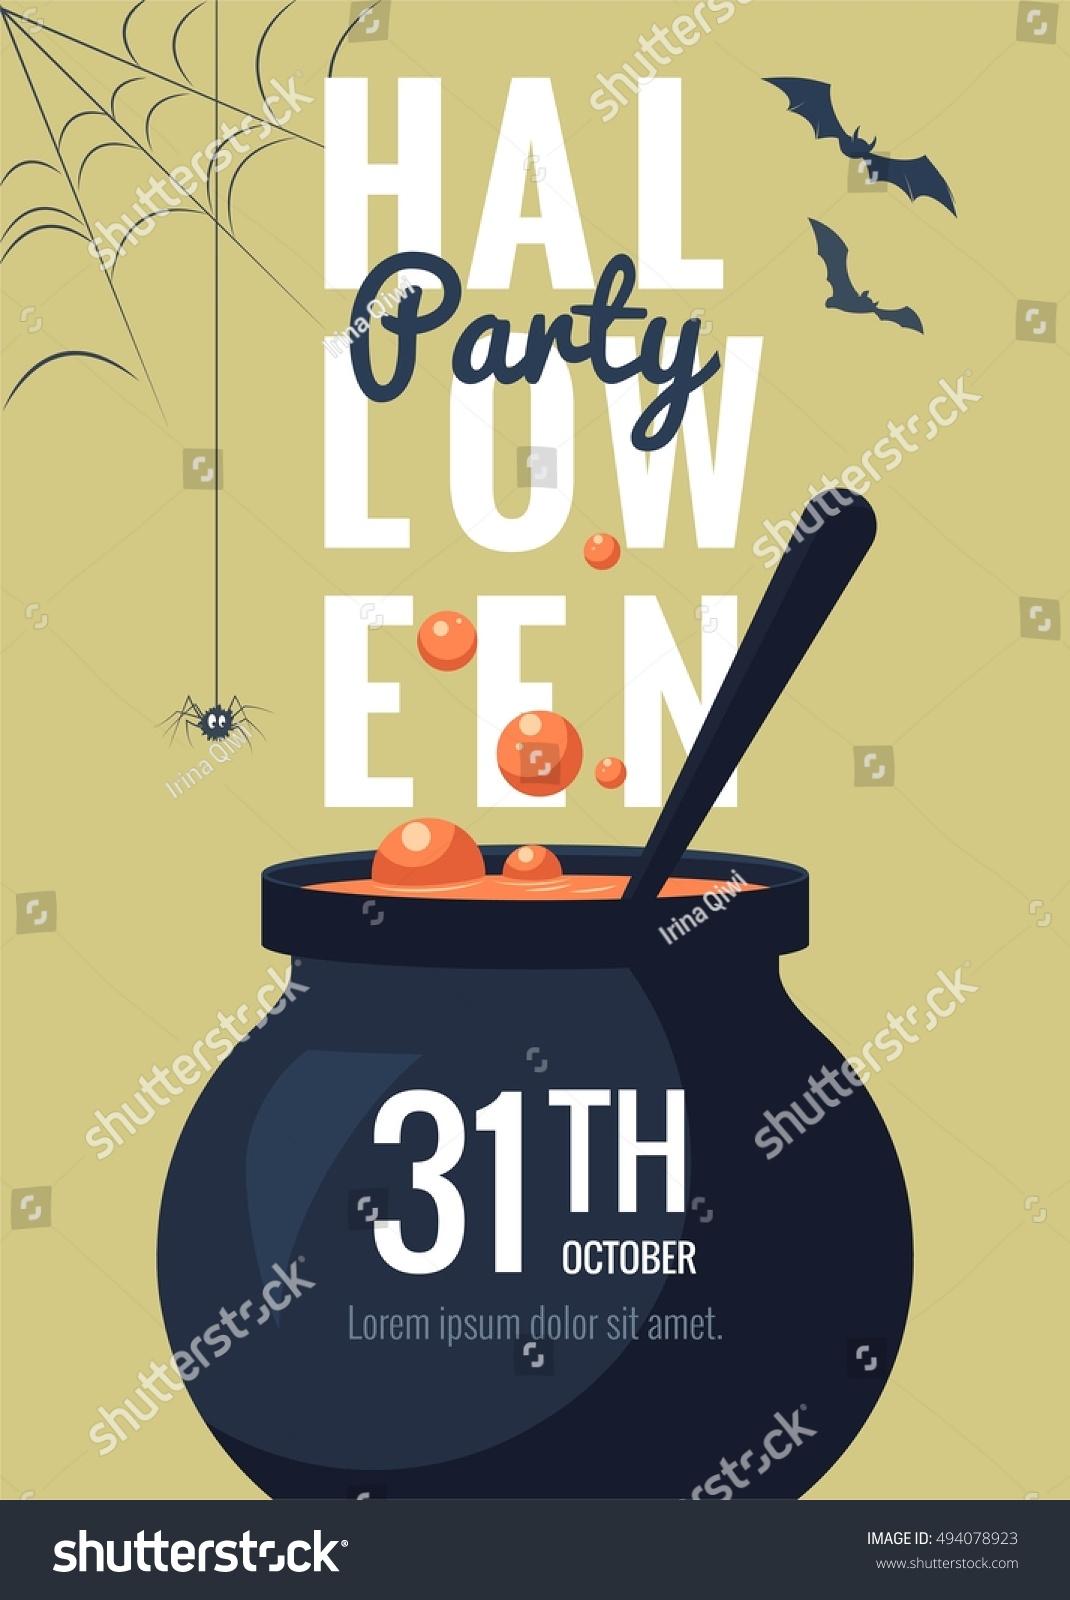 Halloween Party Invitation Cartoon Style Funny Stock Vector ...